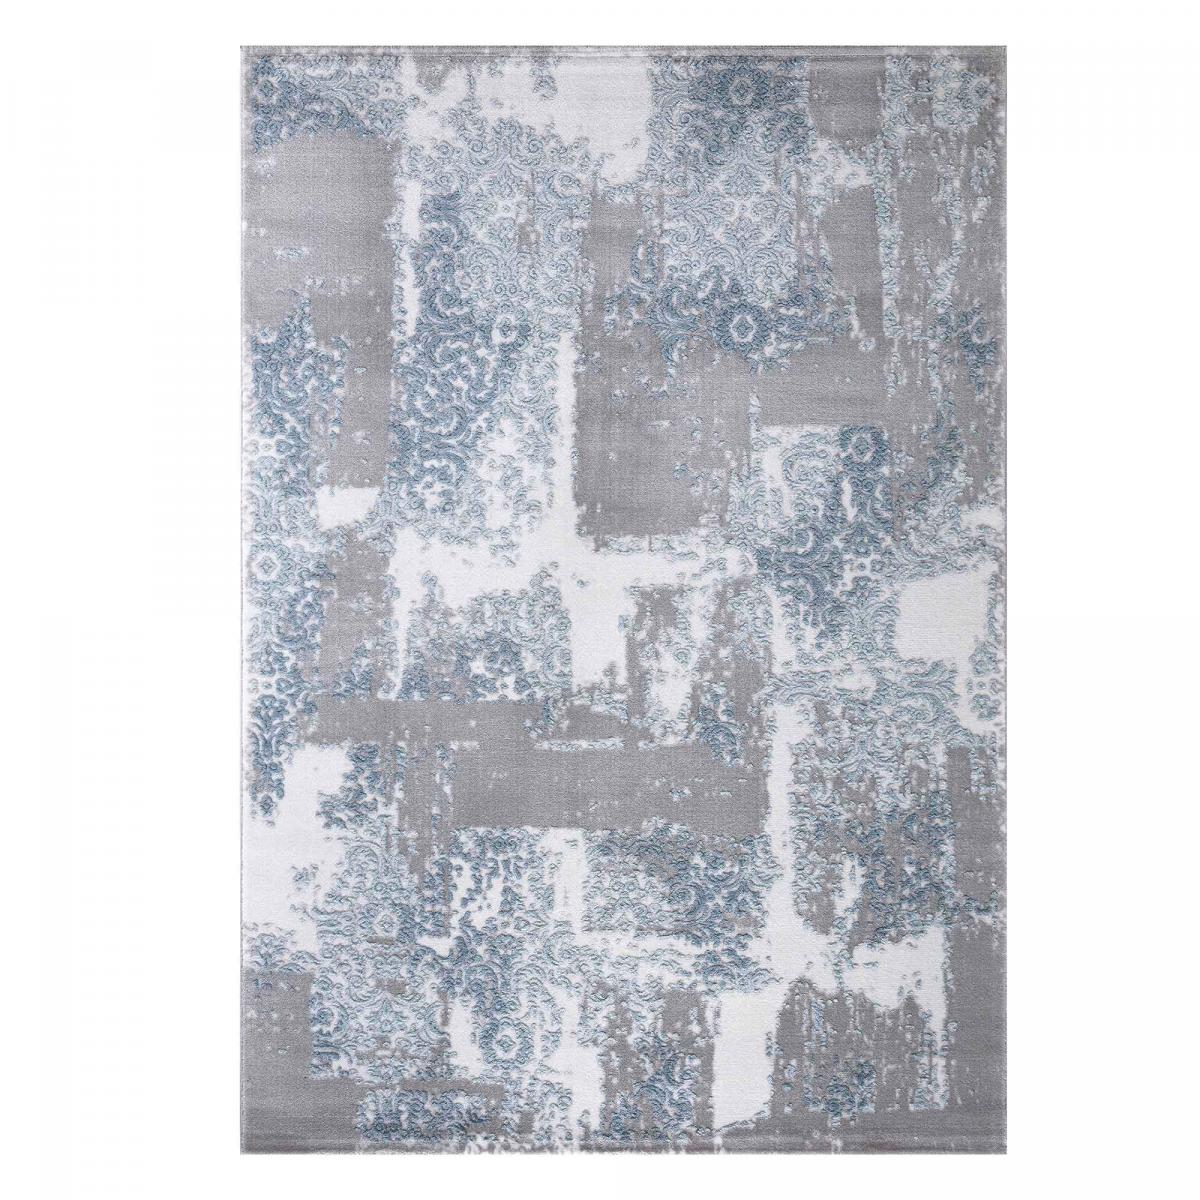 Tapis design en acrylique bleu 160x230